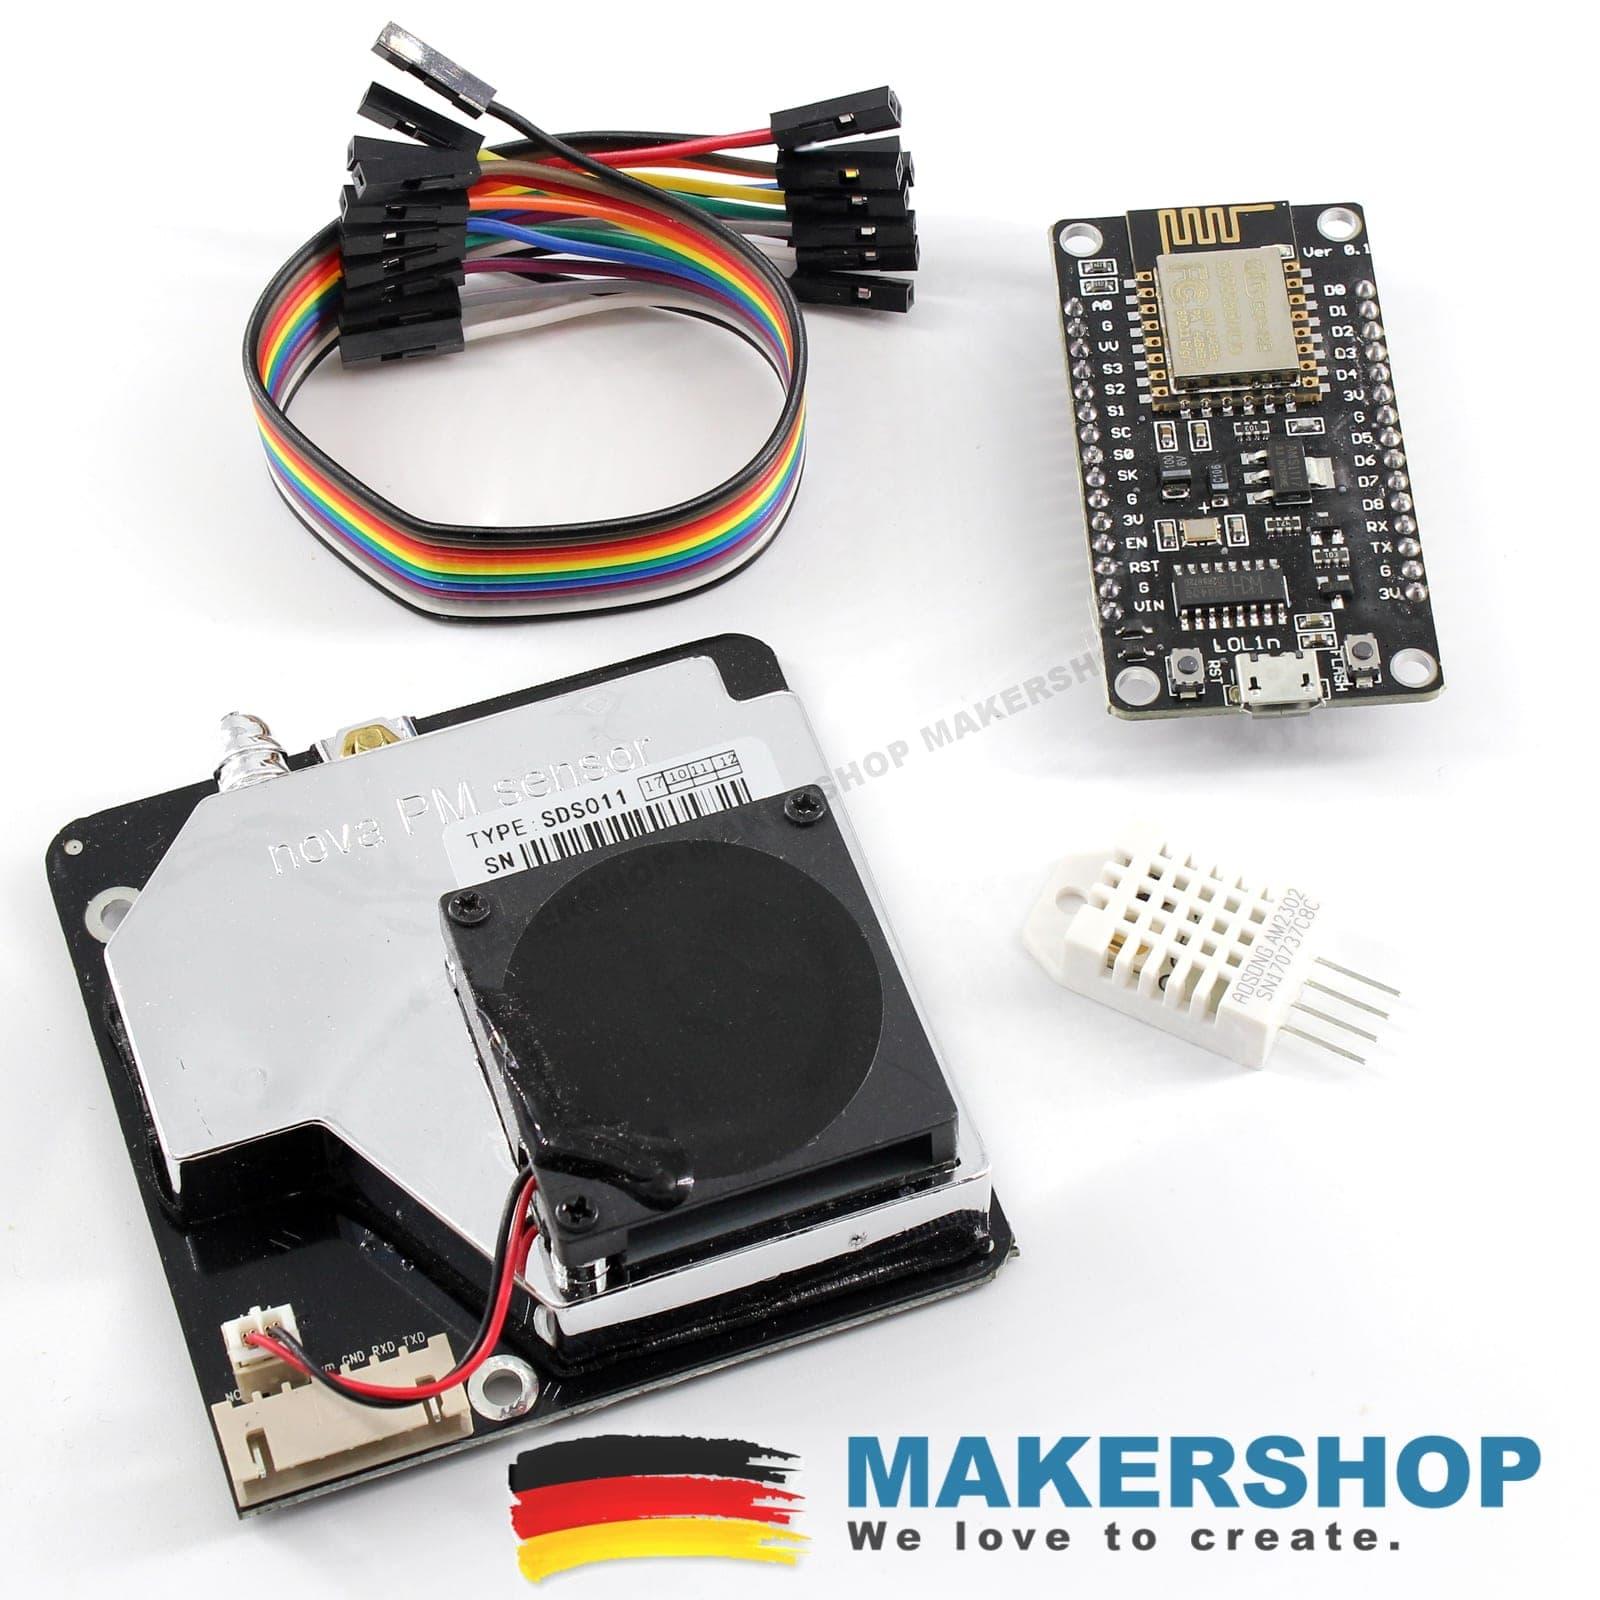 feinstaub sensor selber bauen kit sds011 dust nova fitness nodemcu luftdaten makershop de. Black Bedroom Furniture Sets. Home Design Ideas